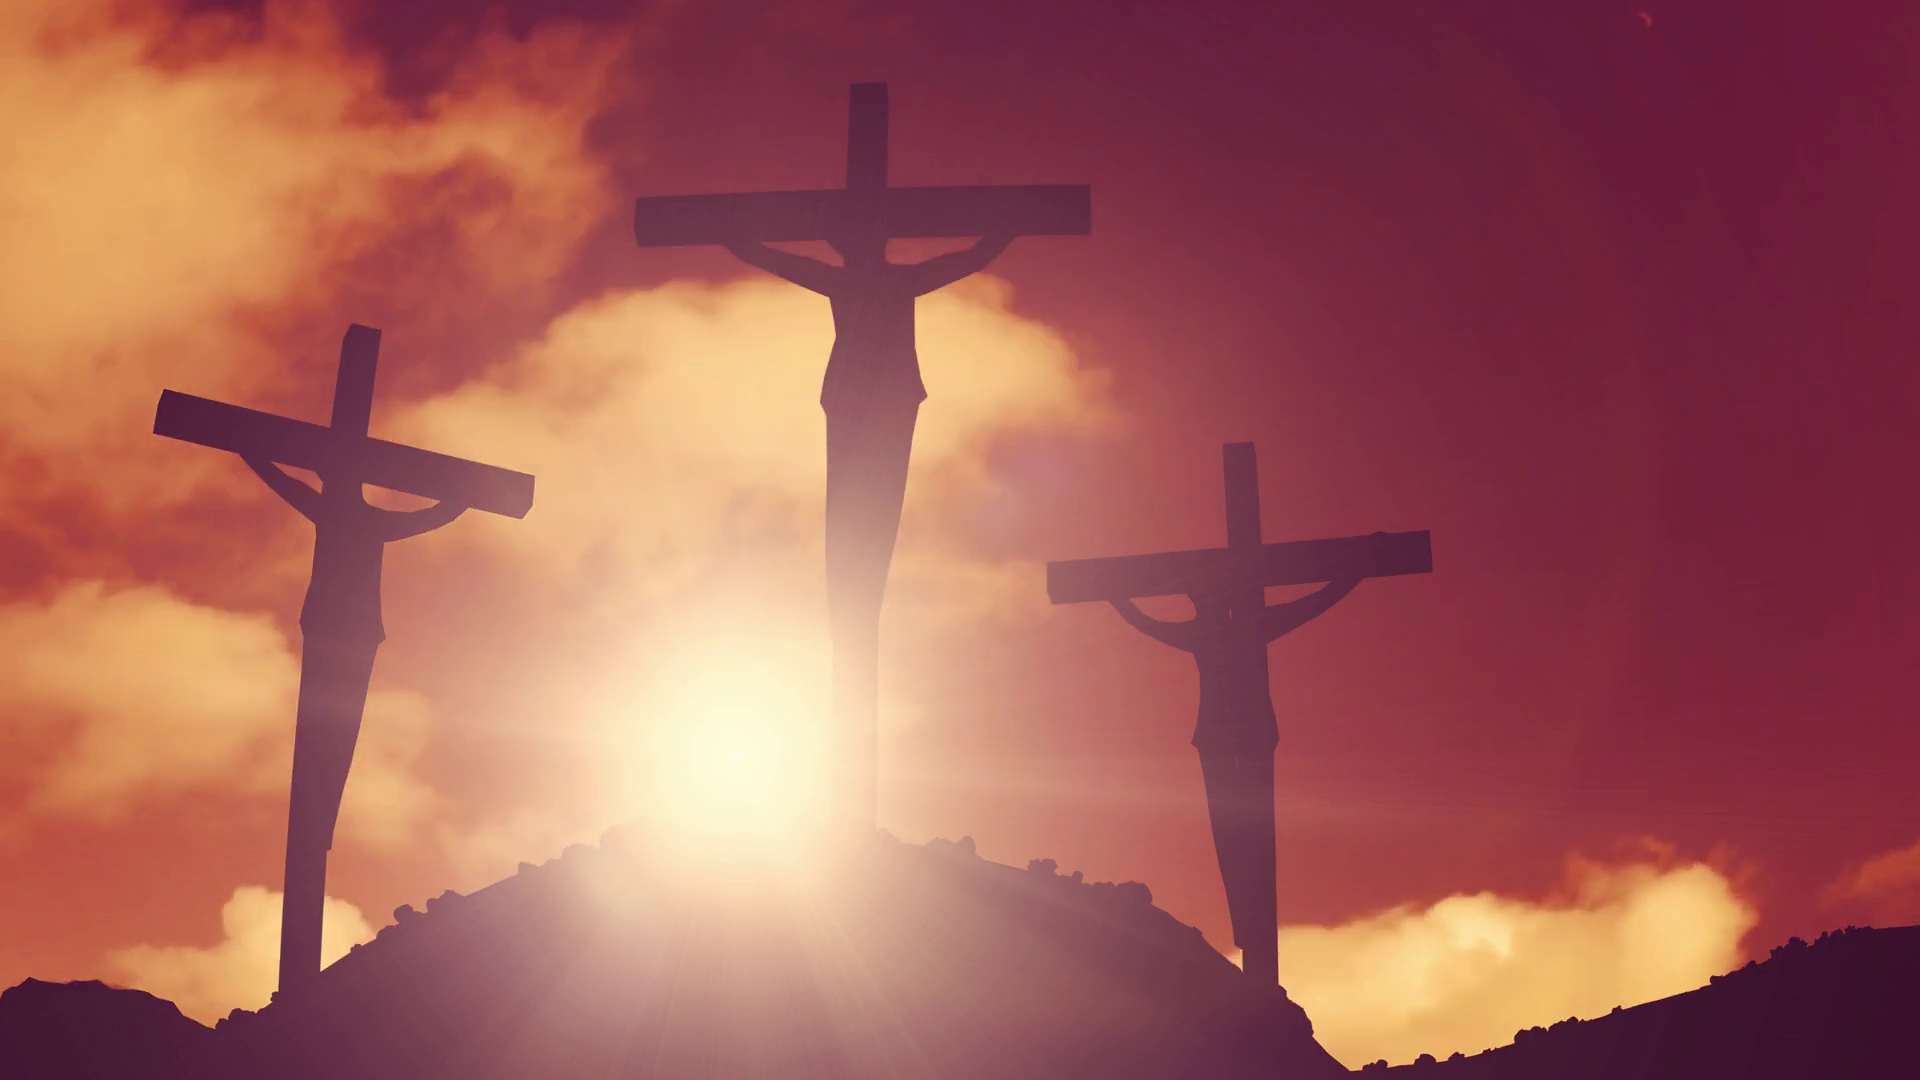 Image Details Source D2v9y0dukr6mq2cloudfront Title Crosses On A Hill Crucifixion Cross Jesus Christ Christian Religion Dimension 1920 X 1080